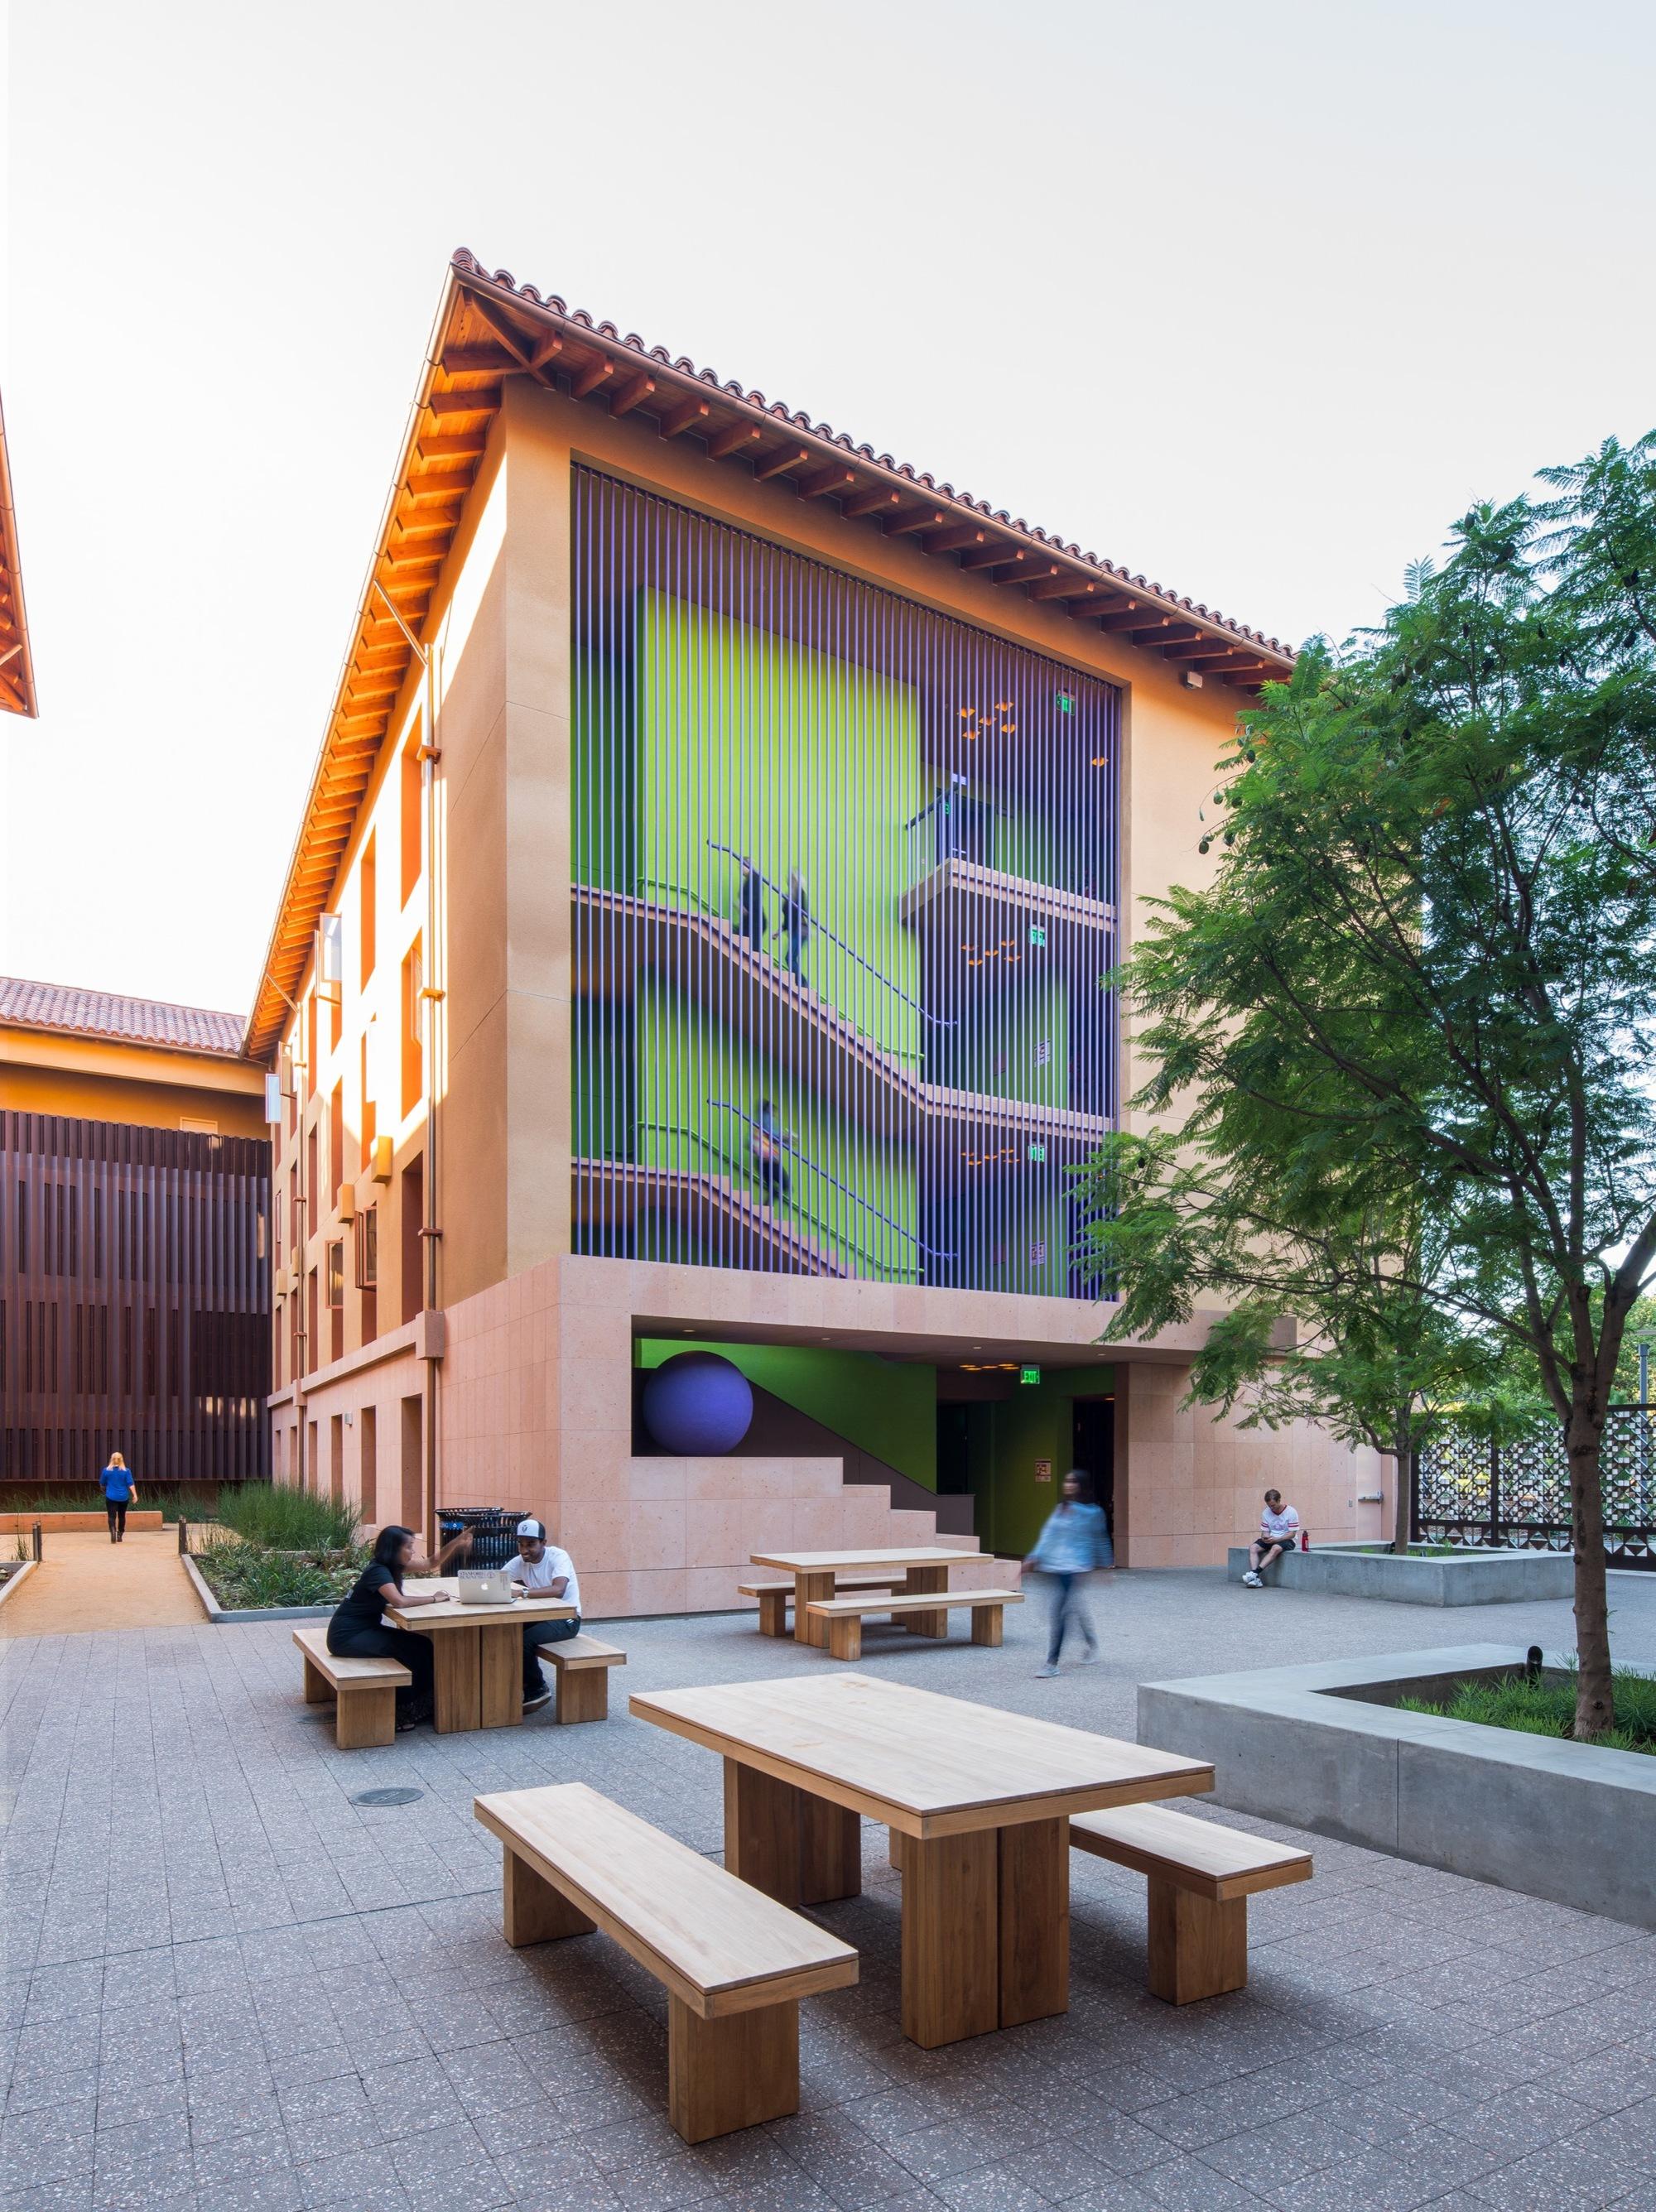 Legorreta Oficina Plataforma Arquitectura # Muebles Ricardo Montes